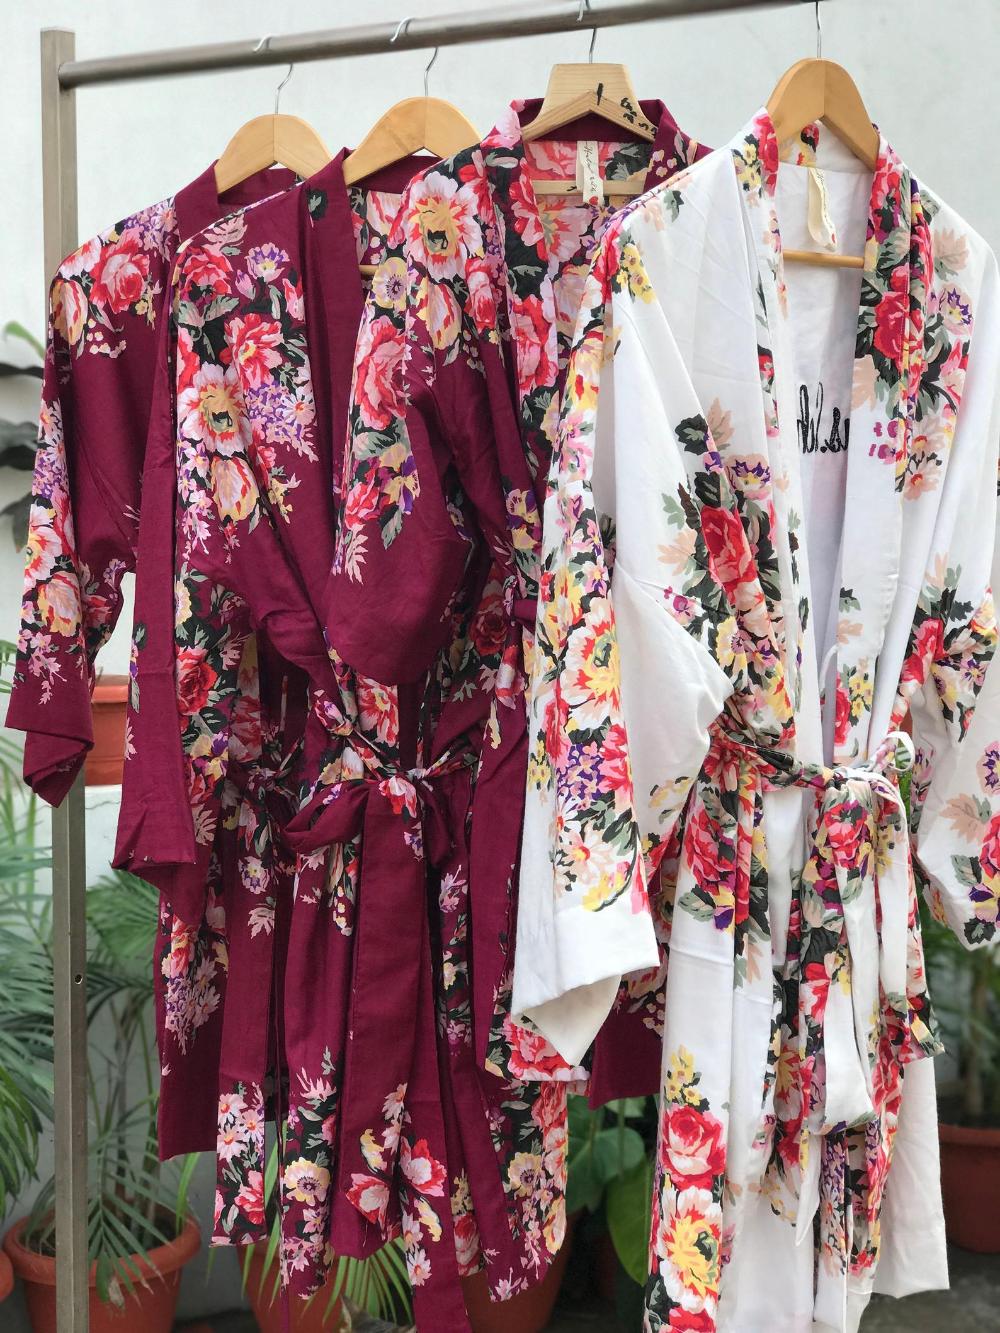 Bulk SALE Maroon floral robe Bridesmaids robes burgundy